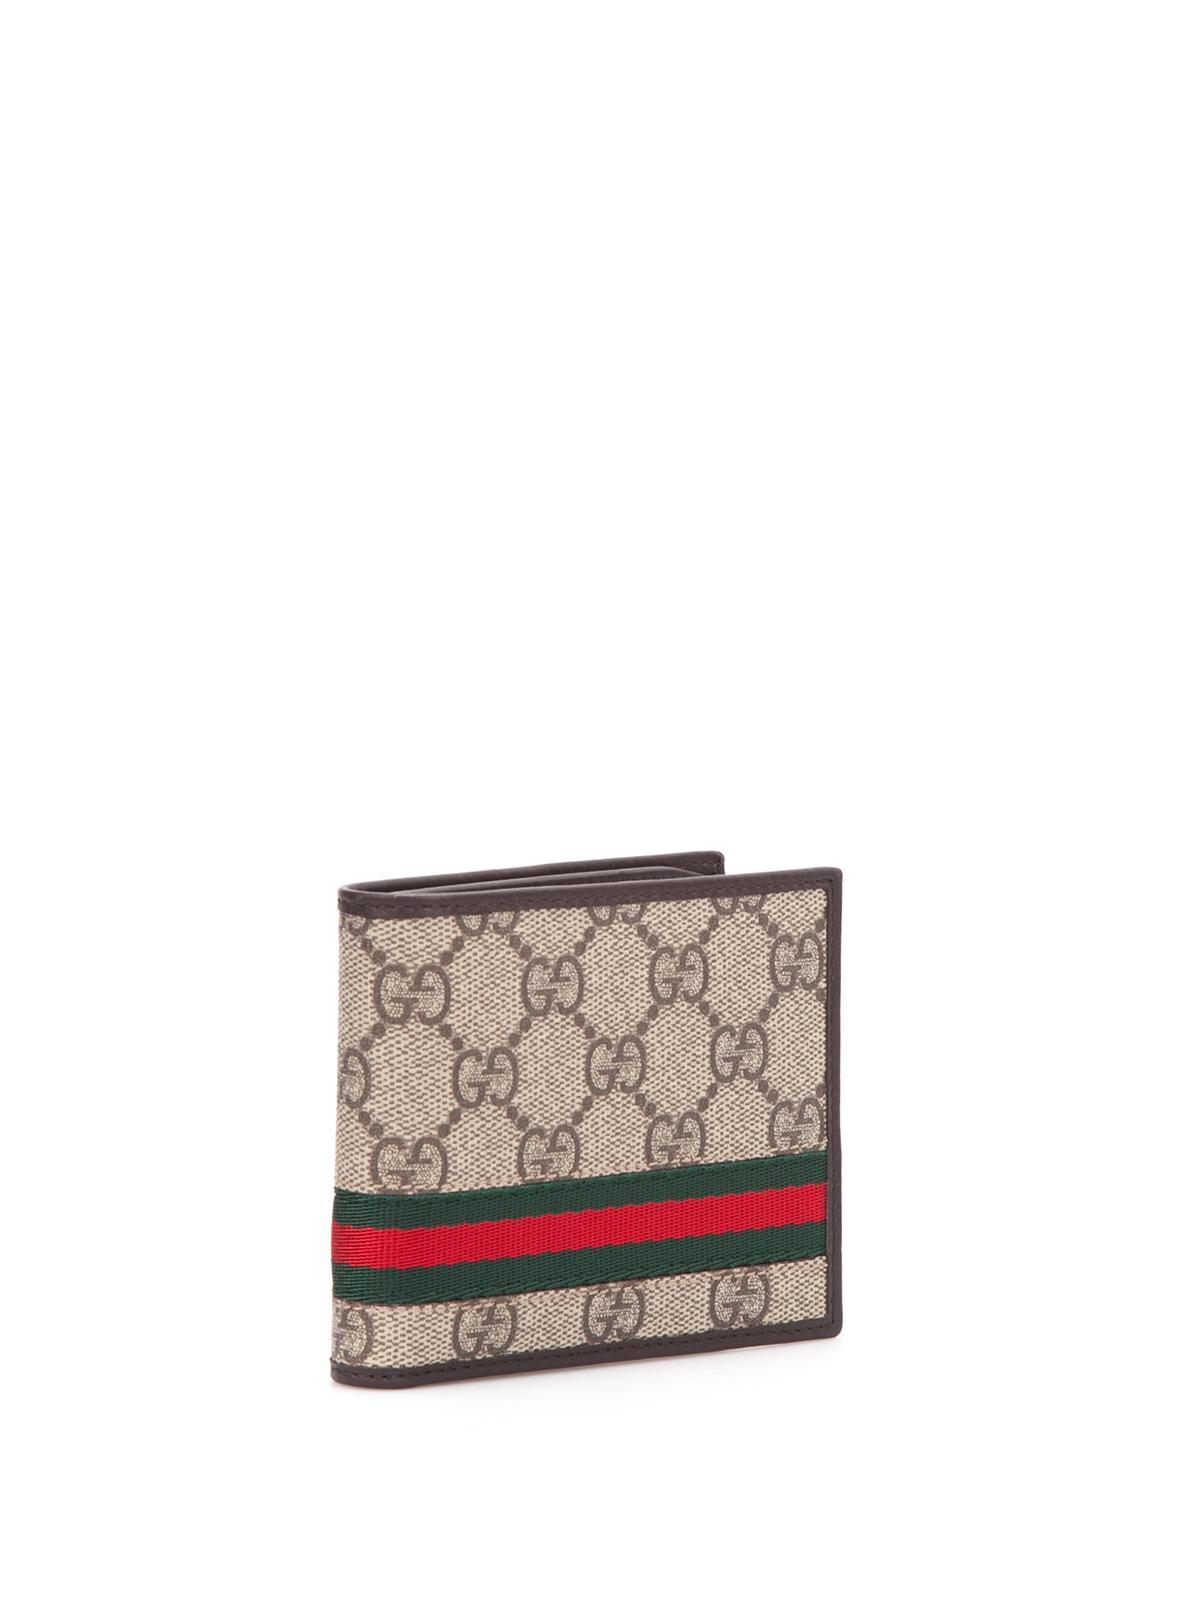 7acdfaada4b7b2 Gucci - GG supreme canvas bi-fold wallet - wallets & purses - 365491 ...